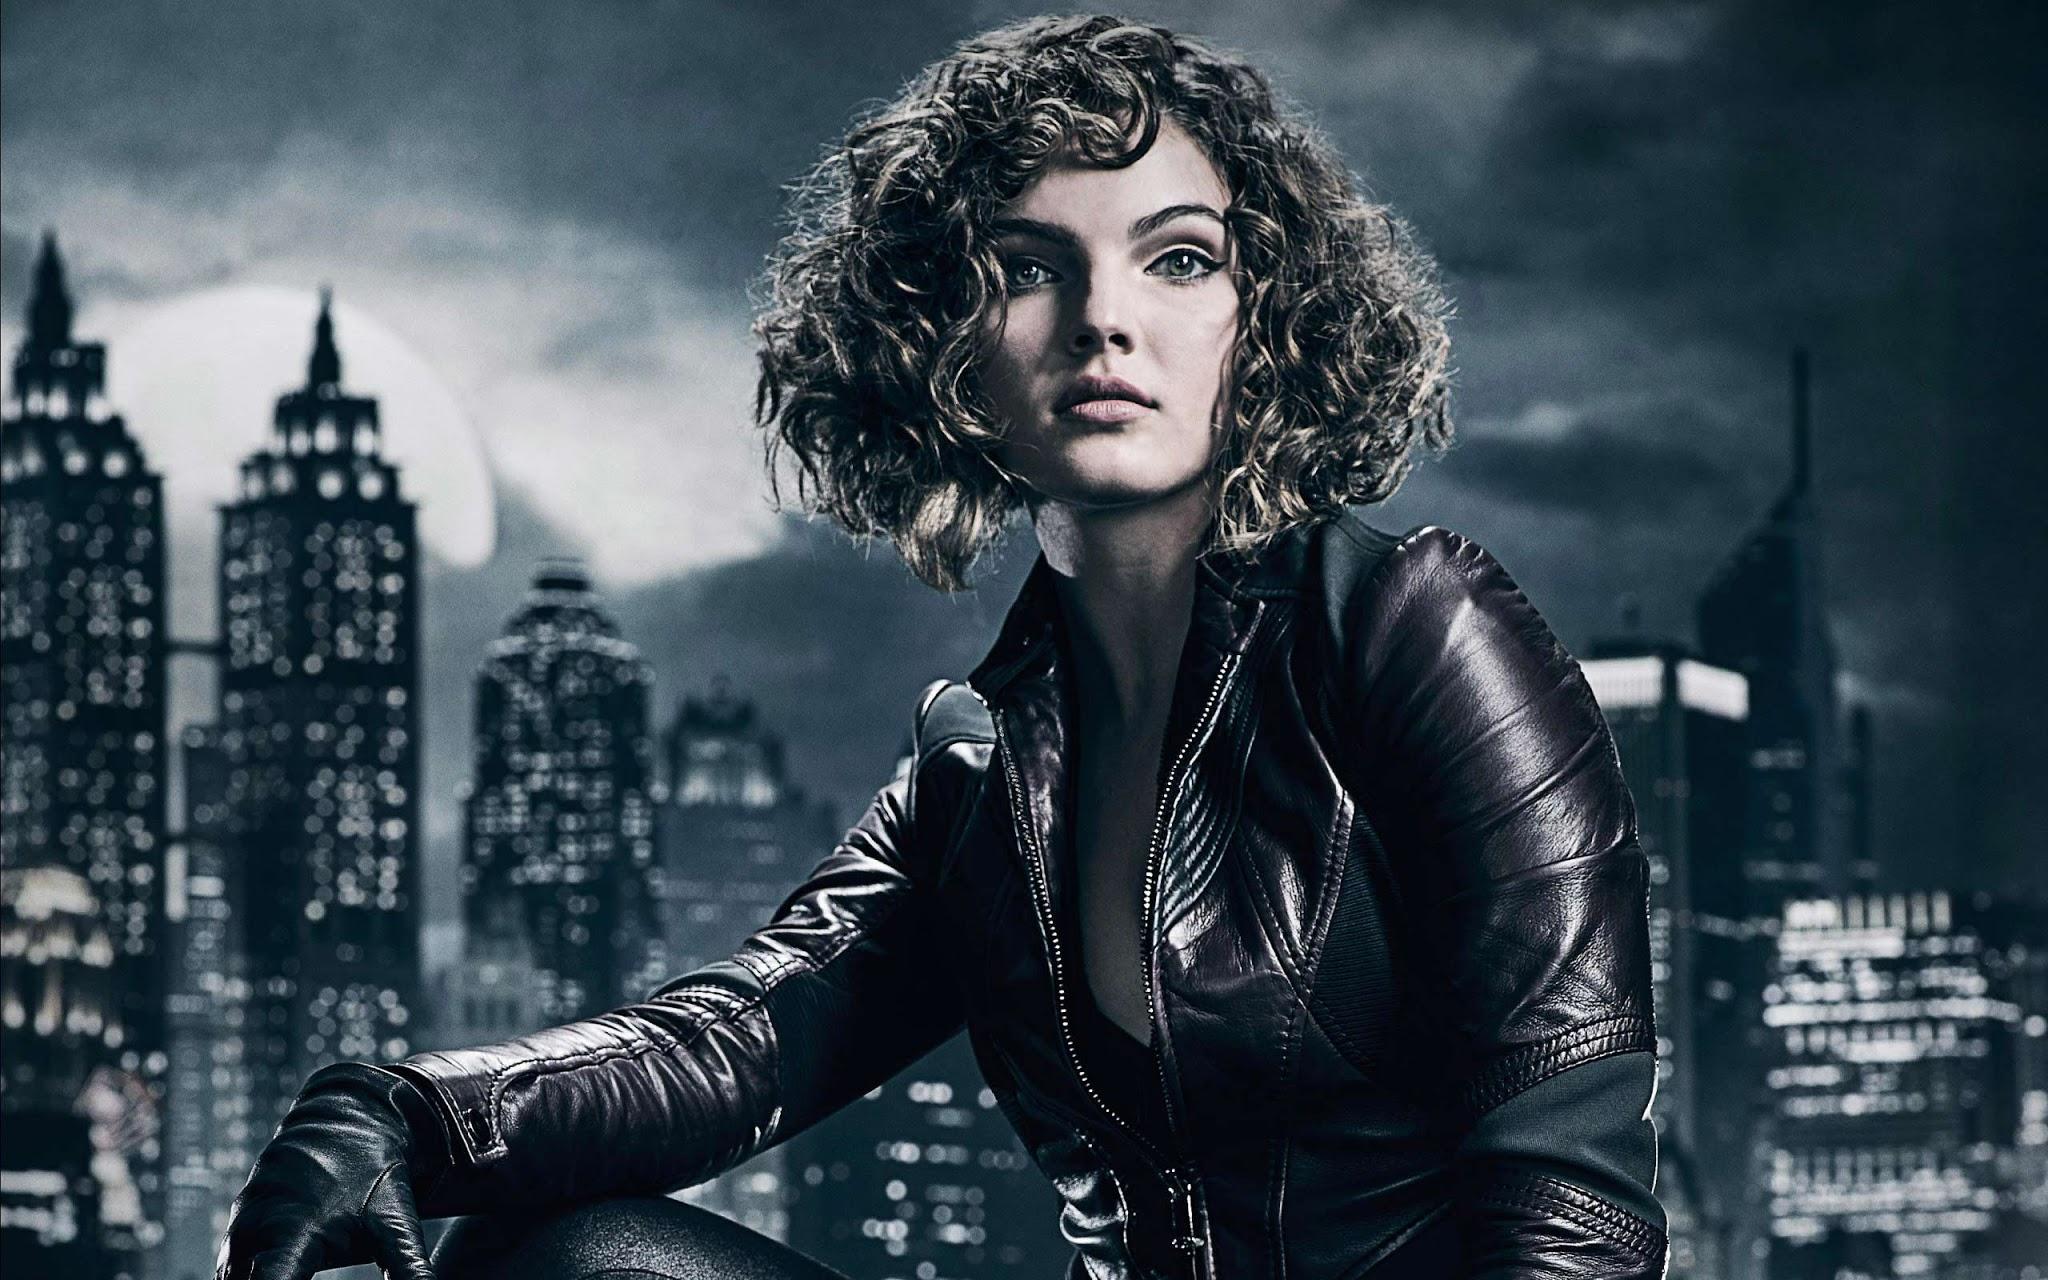 Gotham Season 4 Camren Bicondova Mulher Gato